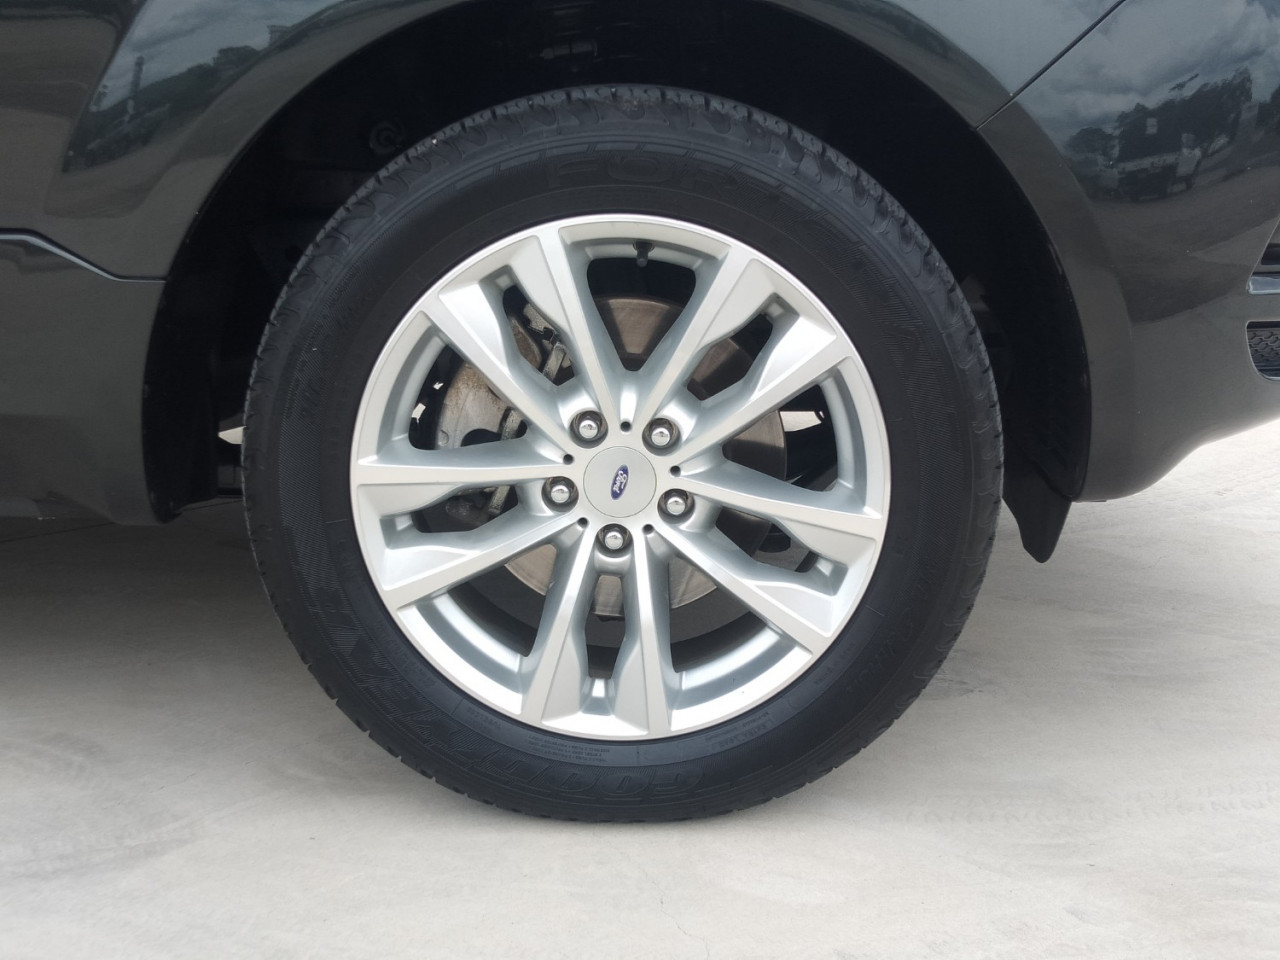 2013 Ford Territory SZ TS Wagon Image 5